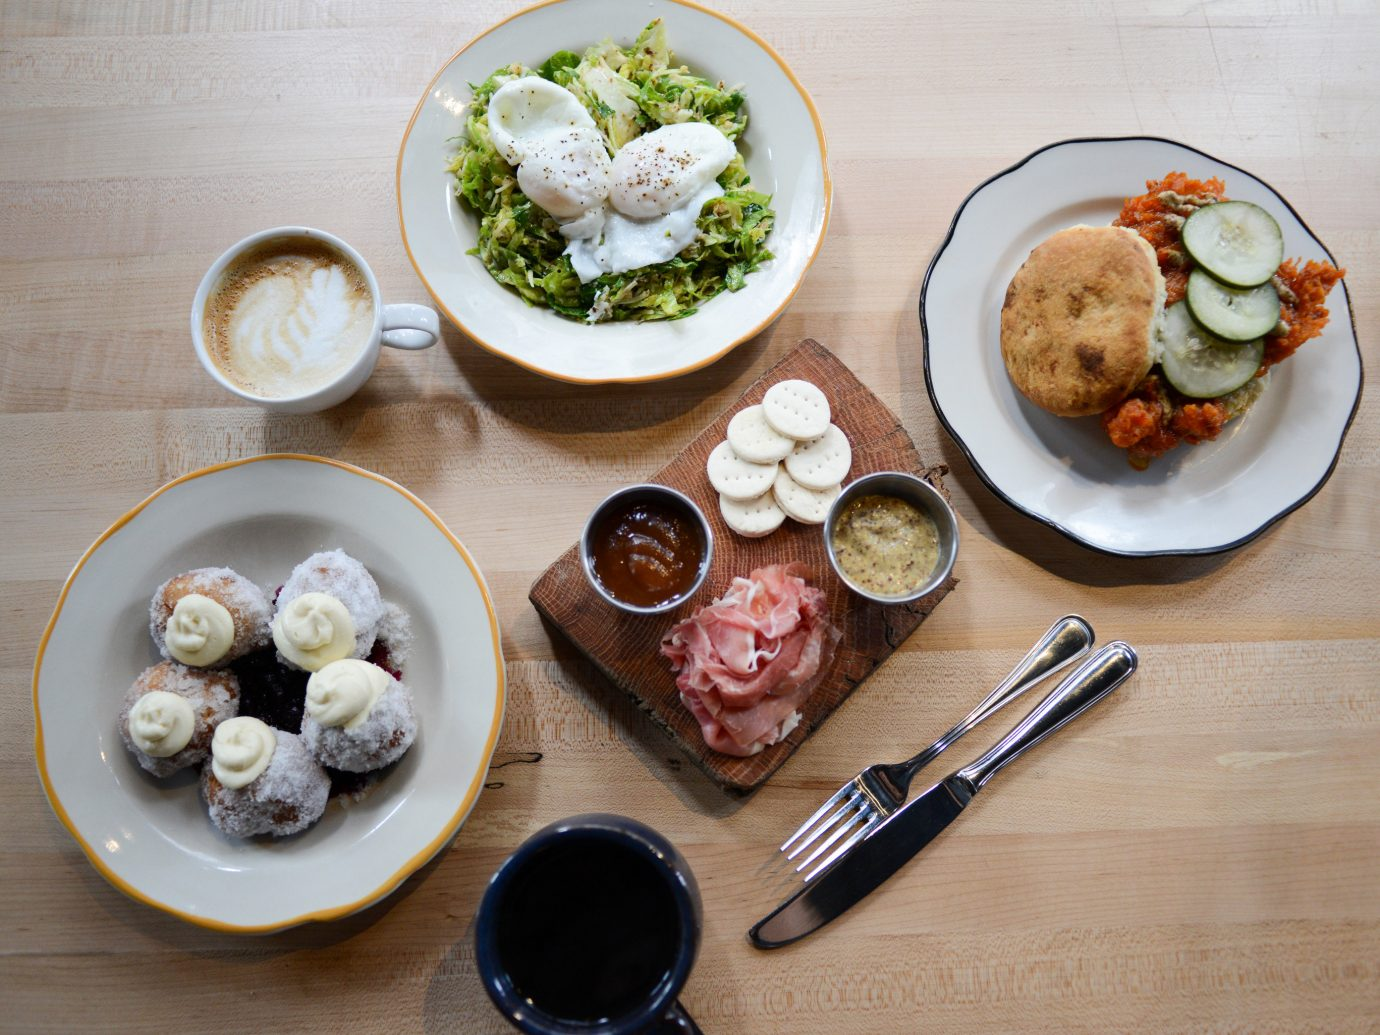 Food + Drink Trip Ideas Weekend Getaways table plate food dish meal breakfast lunch wooden cuisine produce sense brunch several